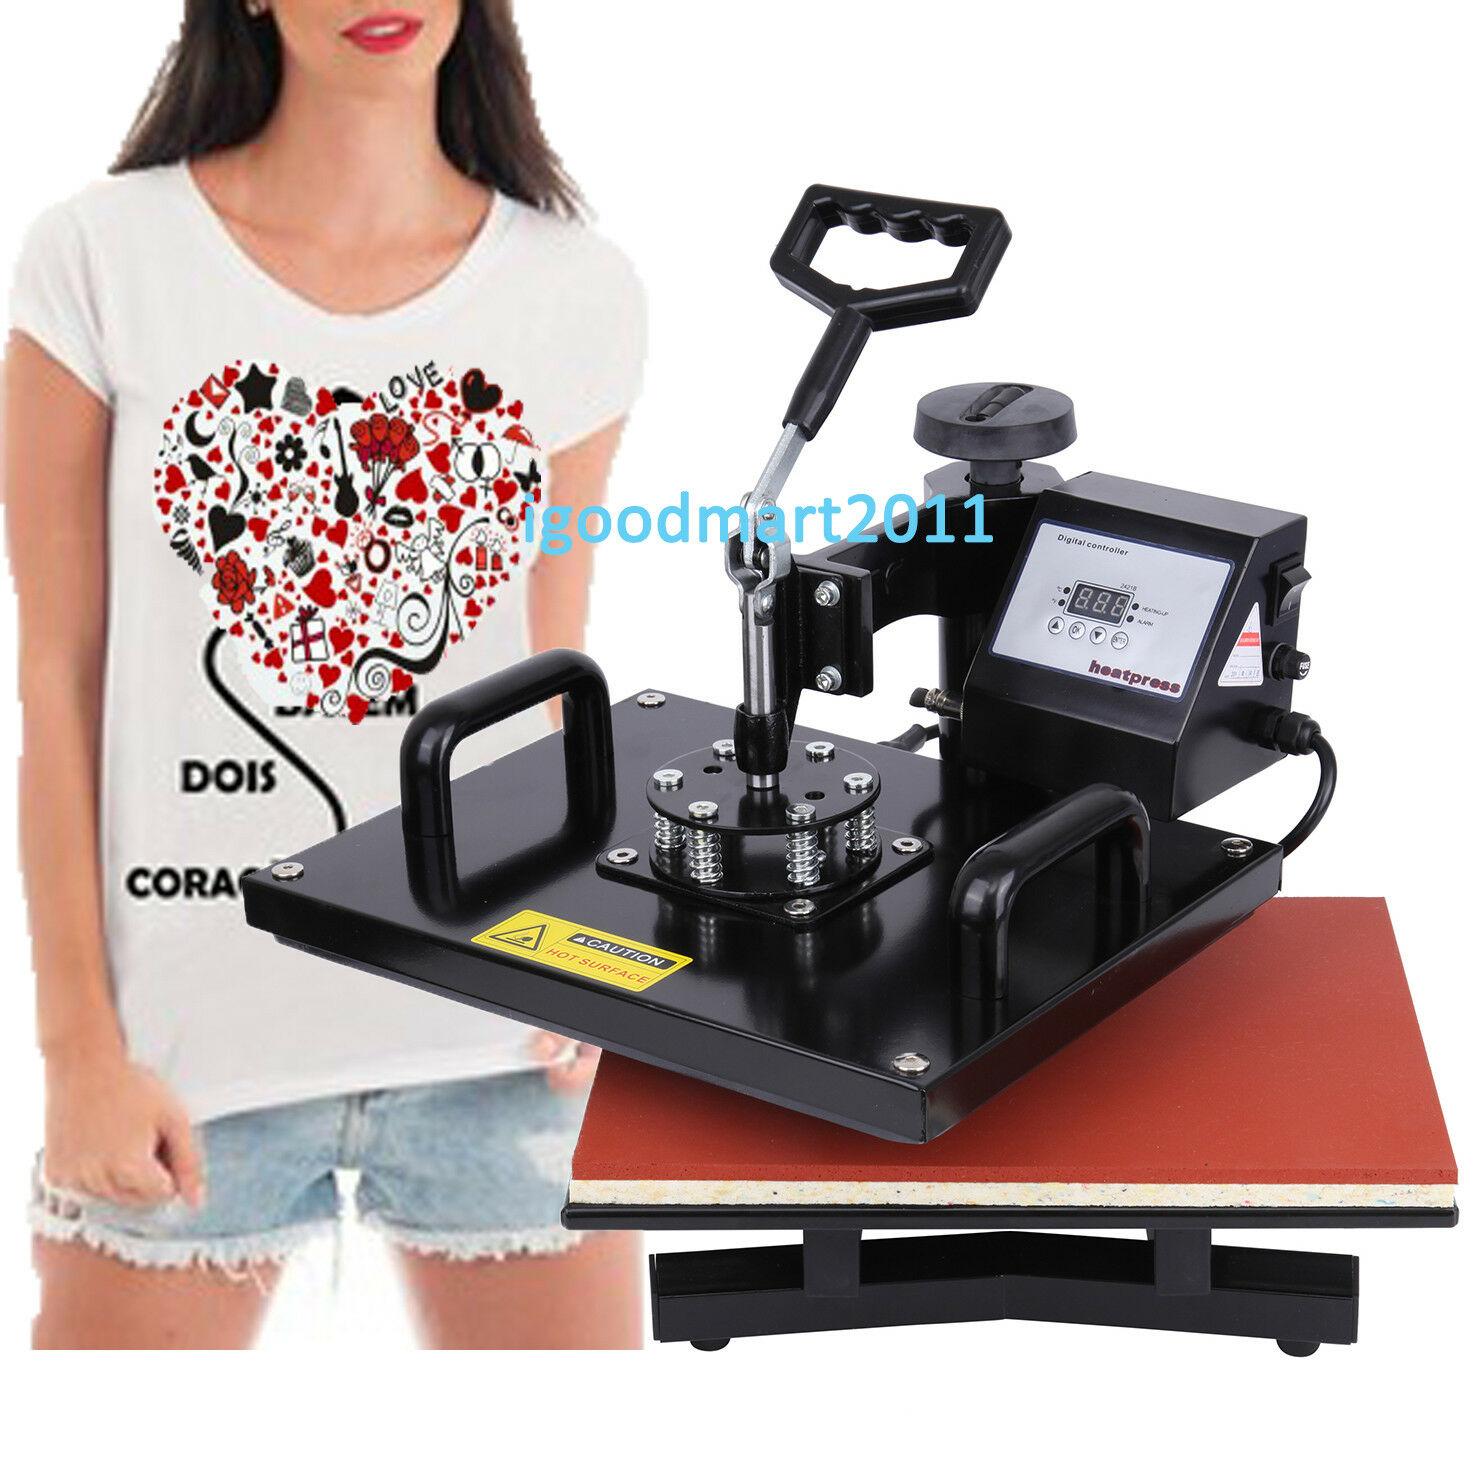 15 x11.4 inch 38 X 30cm Heat Press Machine Transfer Printers T-shirts Sublimation Fabric Cap Swing-away